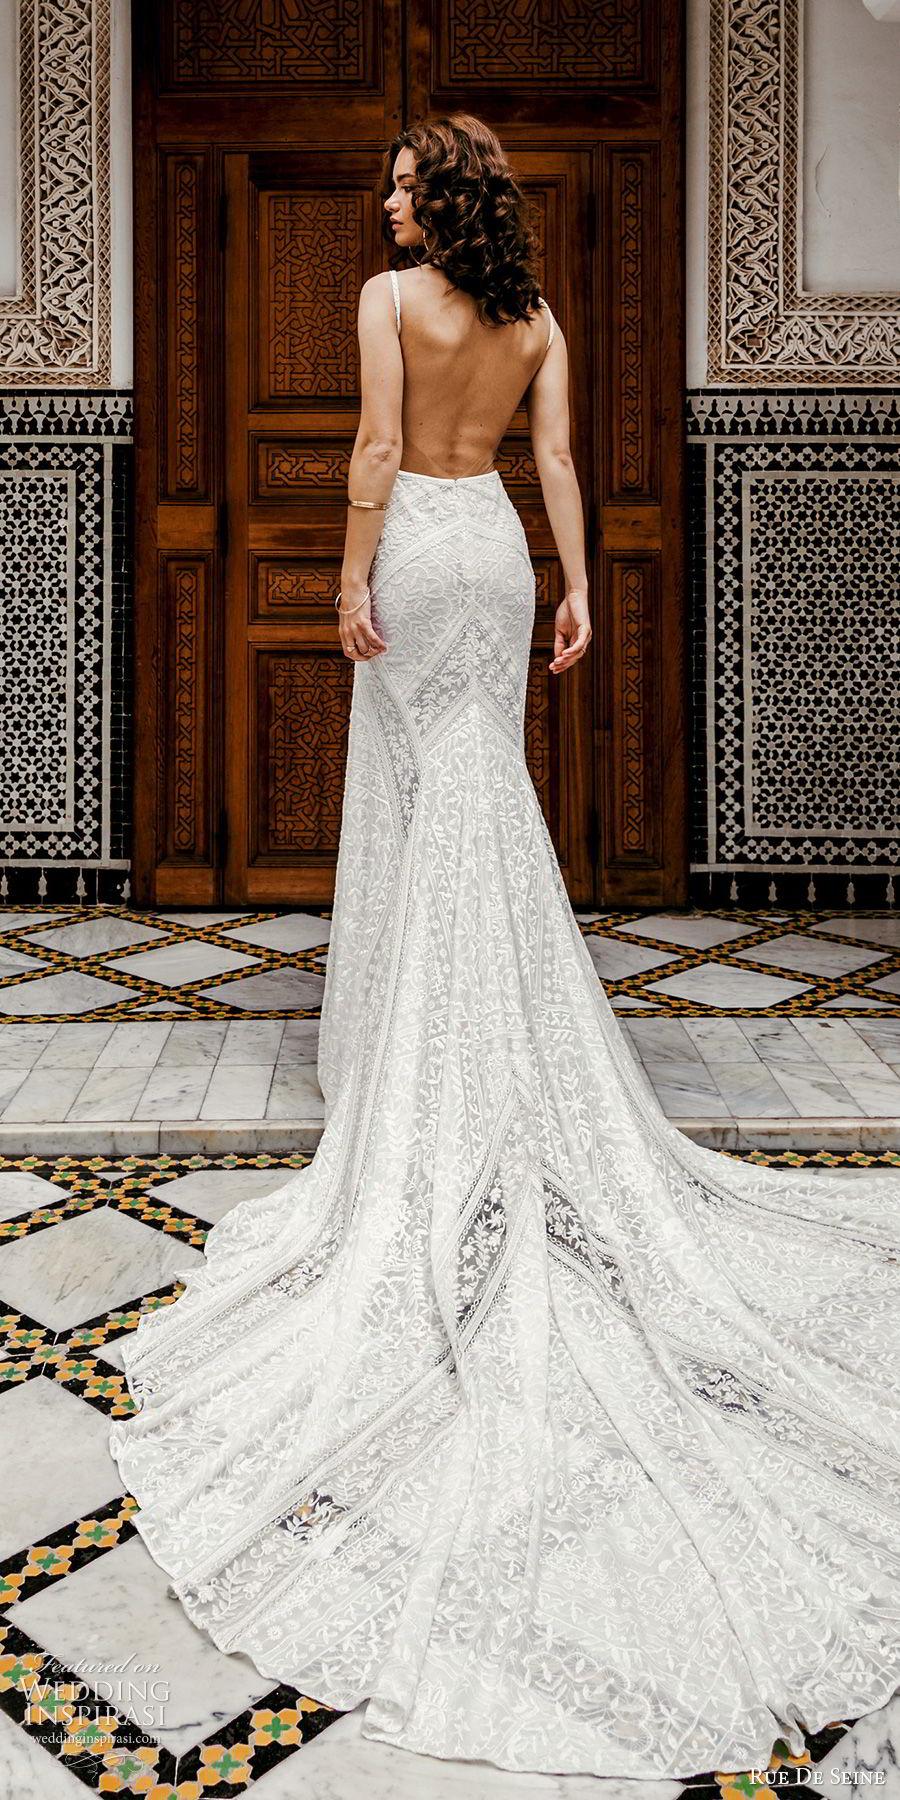 rue de seine 2019 bridal sleeveless thick straps deep v neckline lace fit flare sheath wedding dress (11) boho chic romantic open back chapel train bv